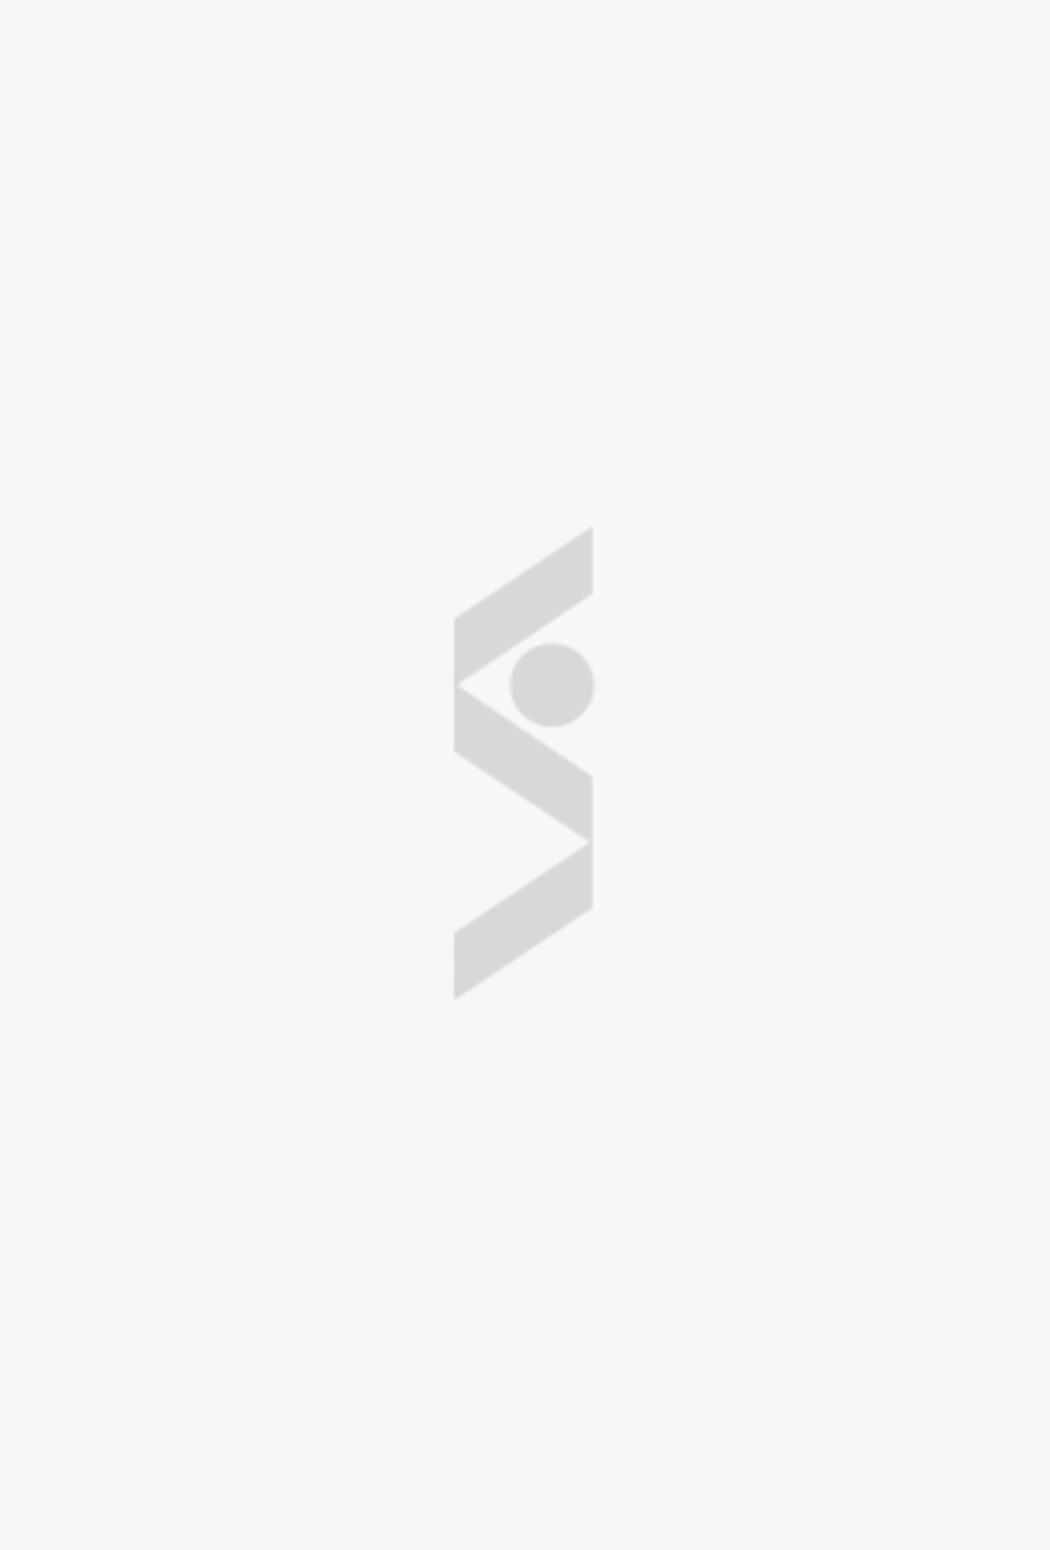 Косметика royal skin купить купить косметику estel интернет магазин